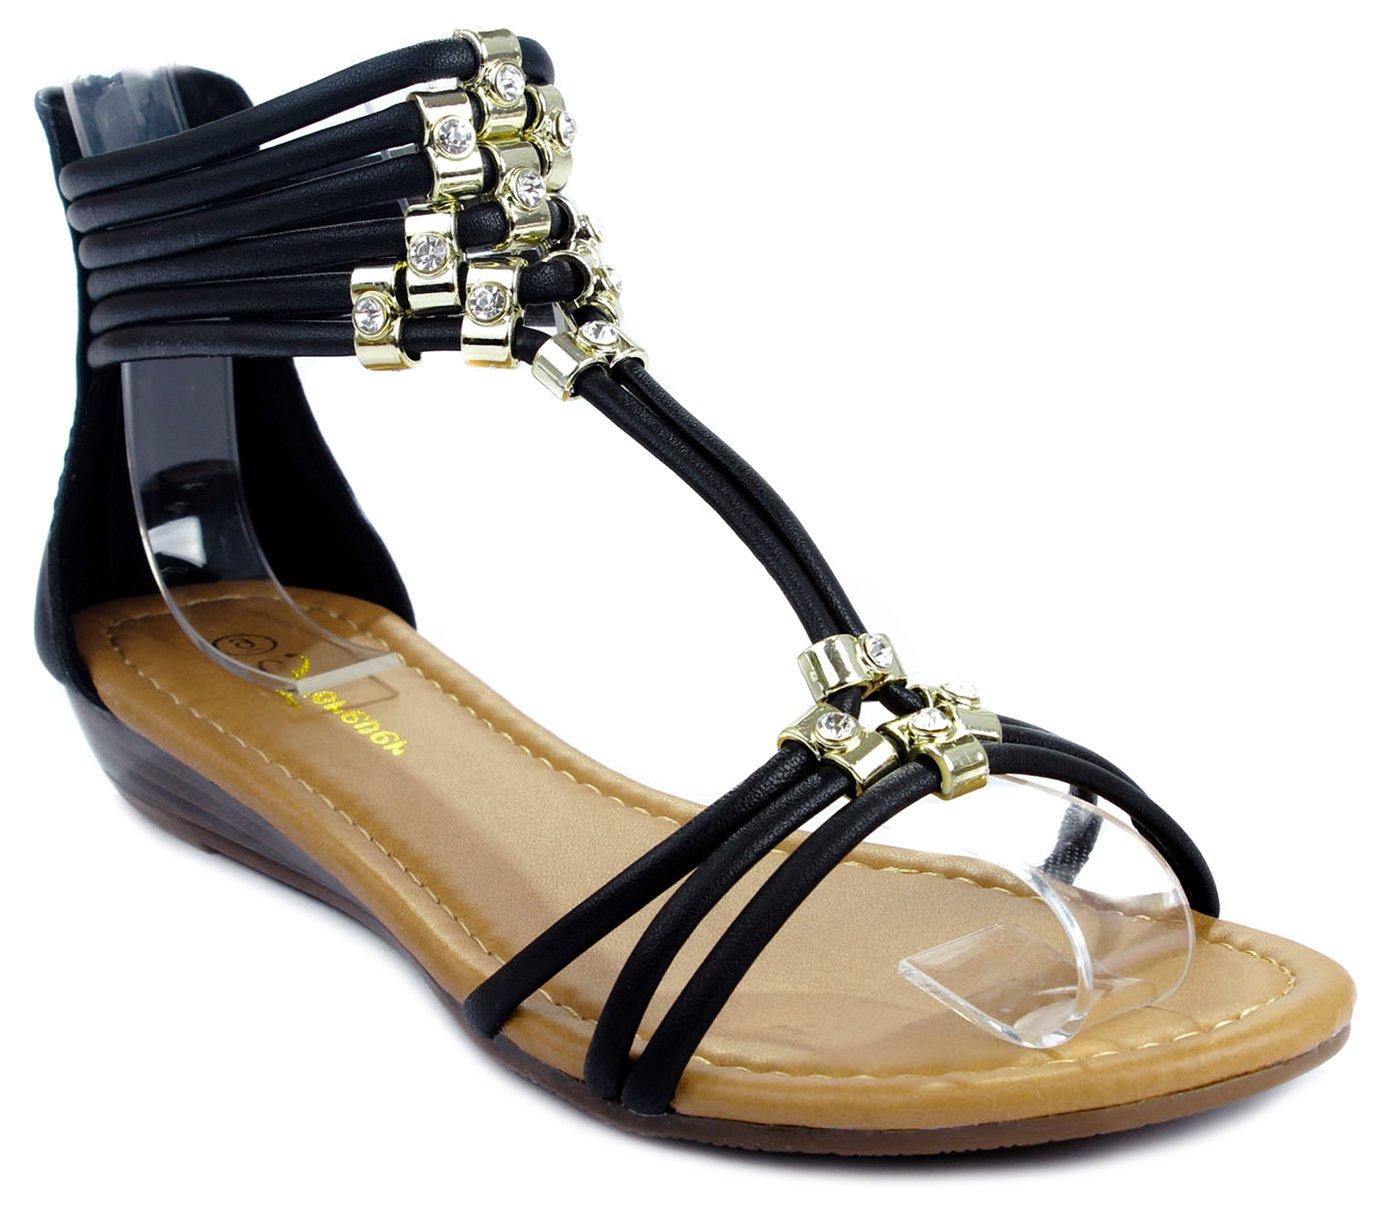 Filosia28 T-Strappy Cord Gold Accent Rhinestone Ankle Cuff Wedge Dress Sandals B00WTMQJSY 6 B(M) US Black